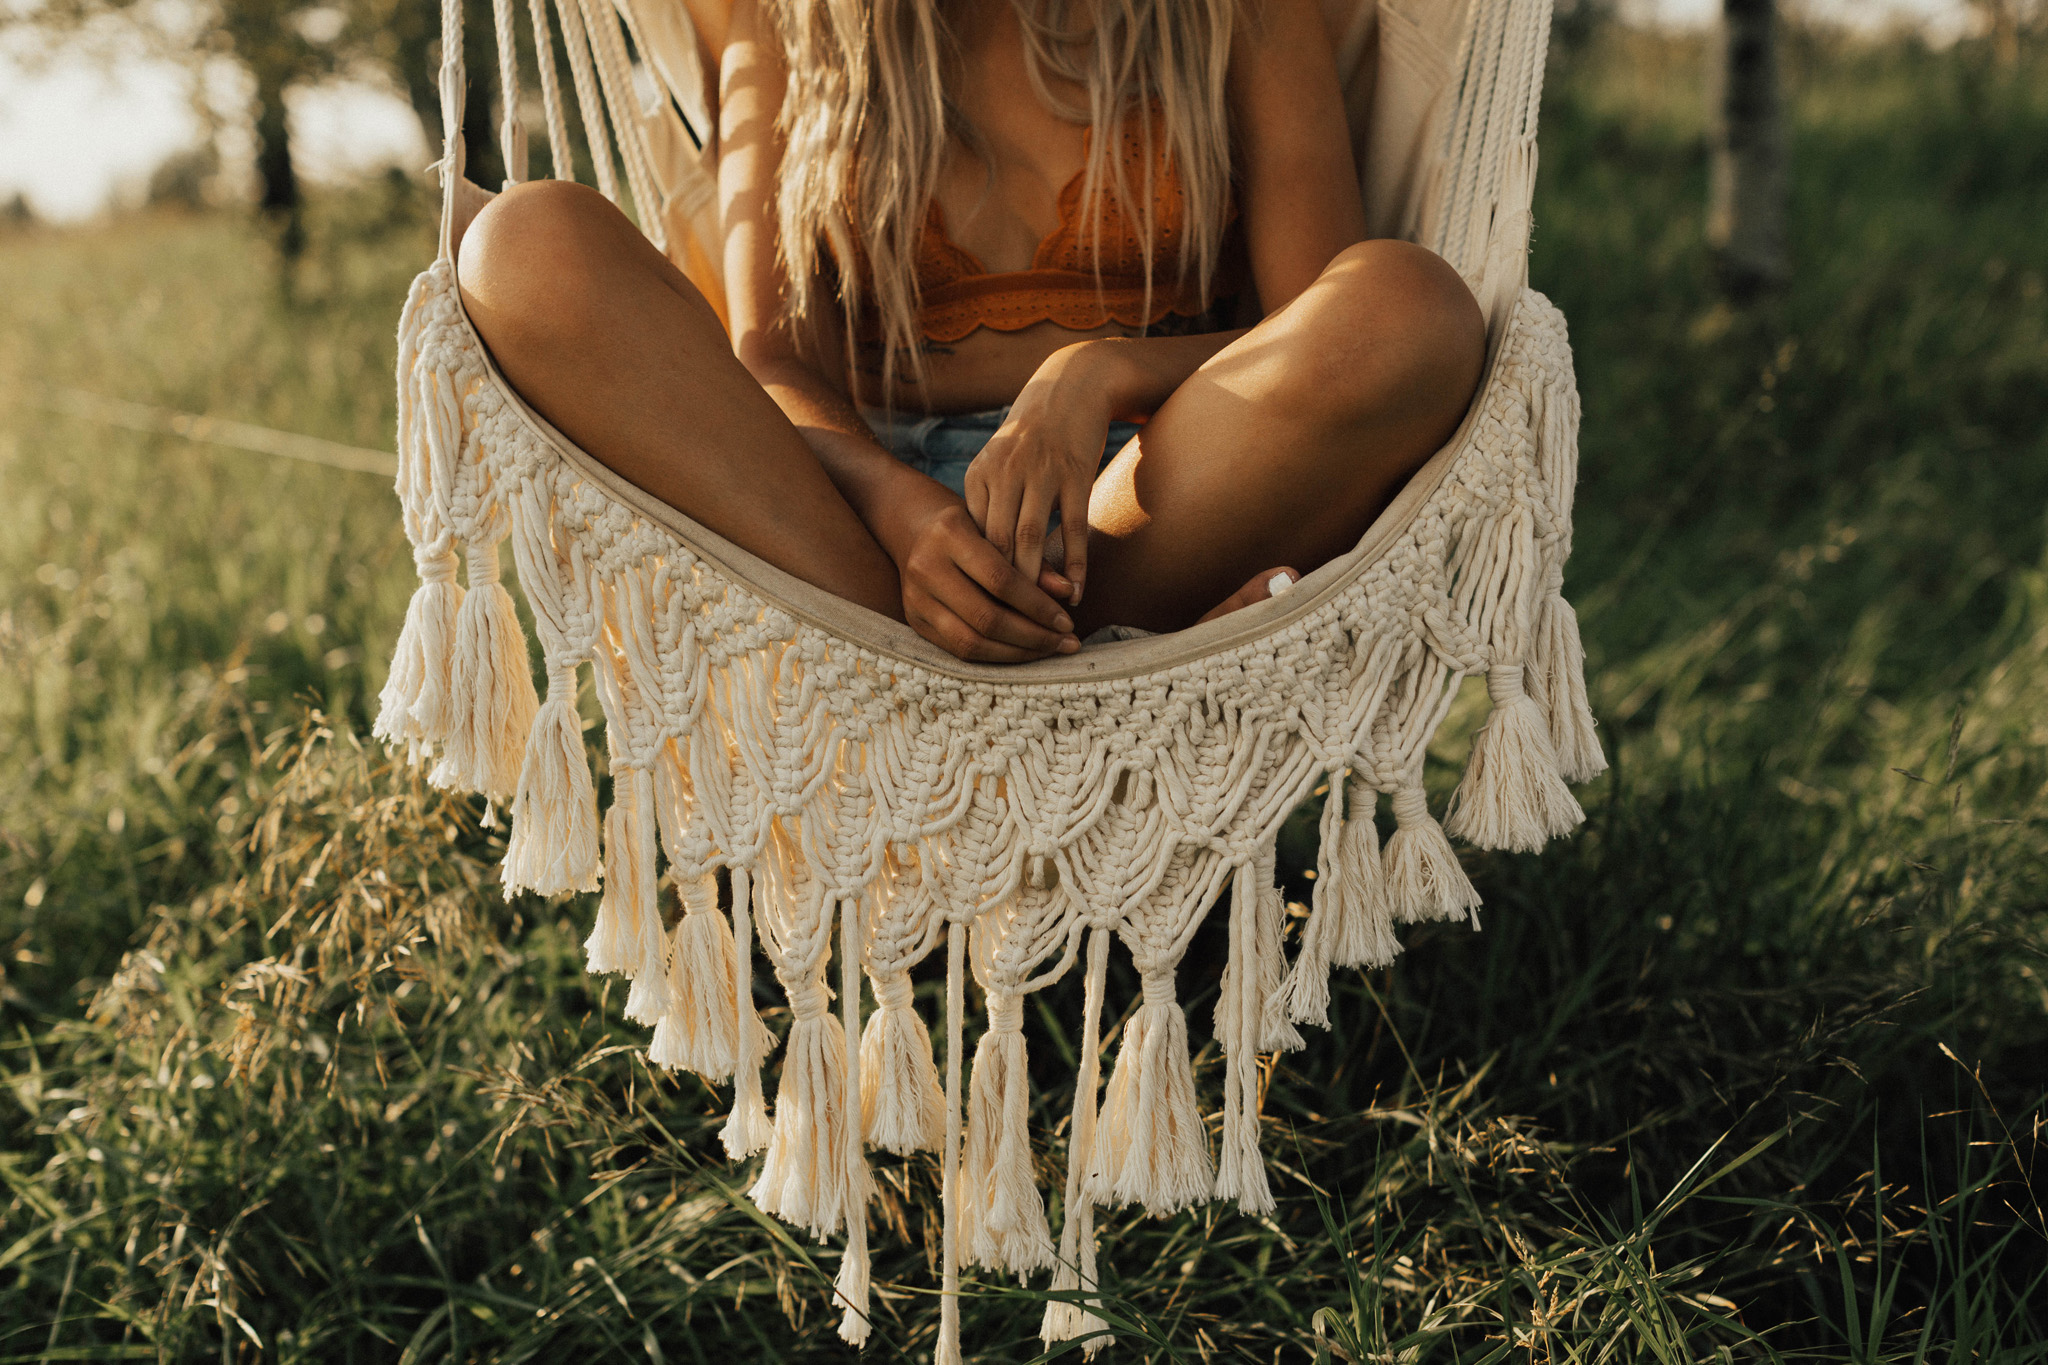 gypsy boler boudoir session - michelle larmand 026